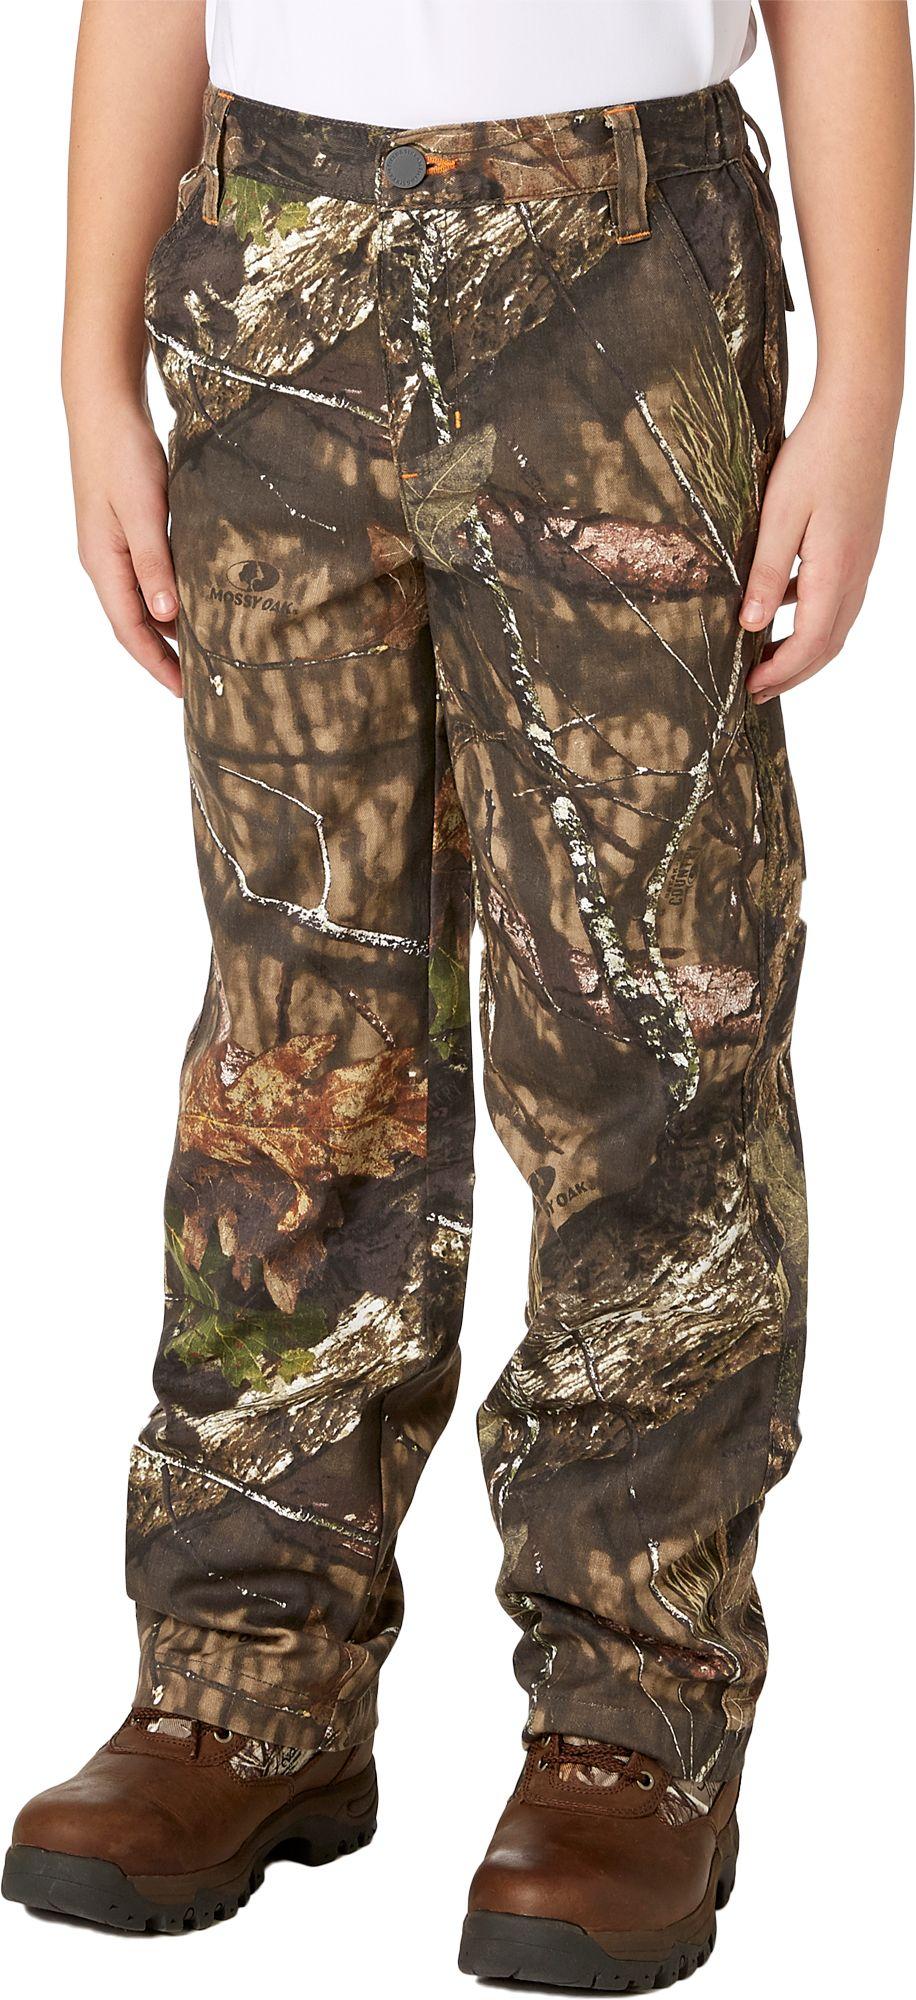 Field & Stream Youth Cotton Twill Pants, Kids, XL, Green